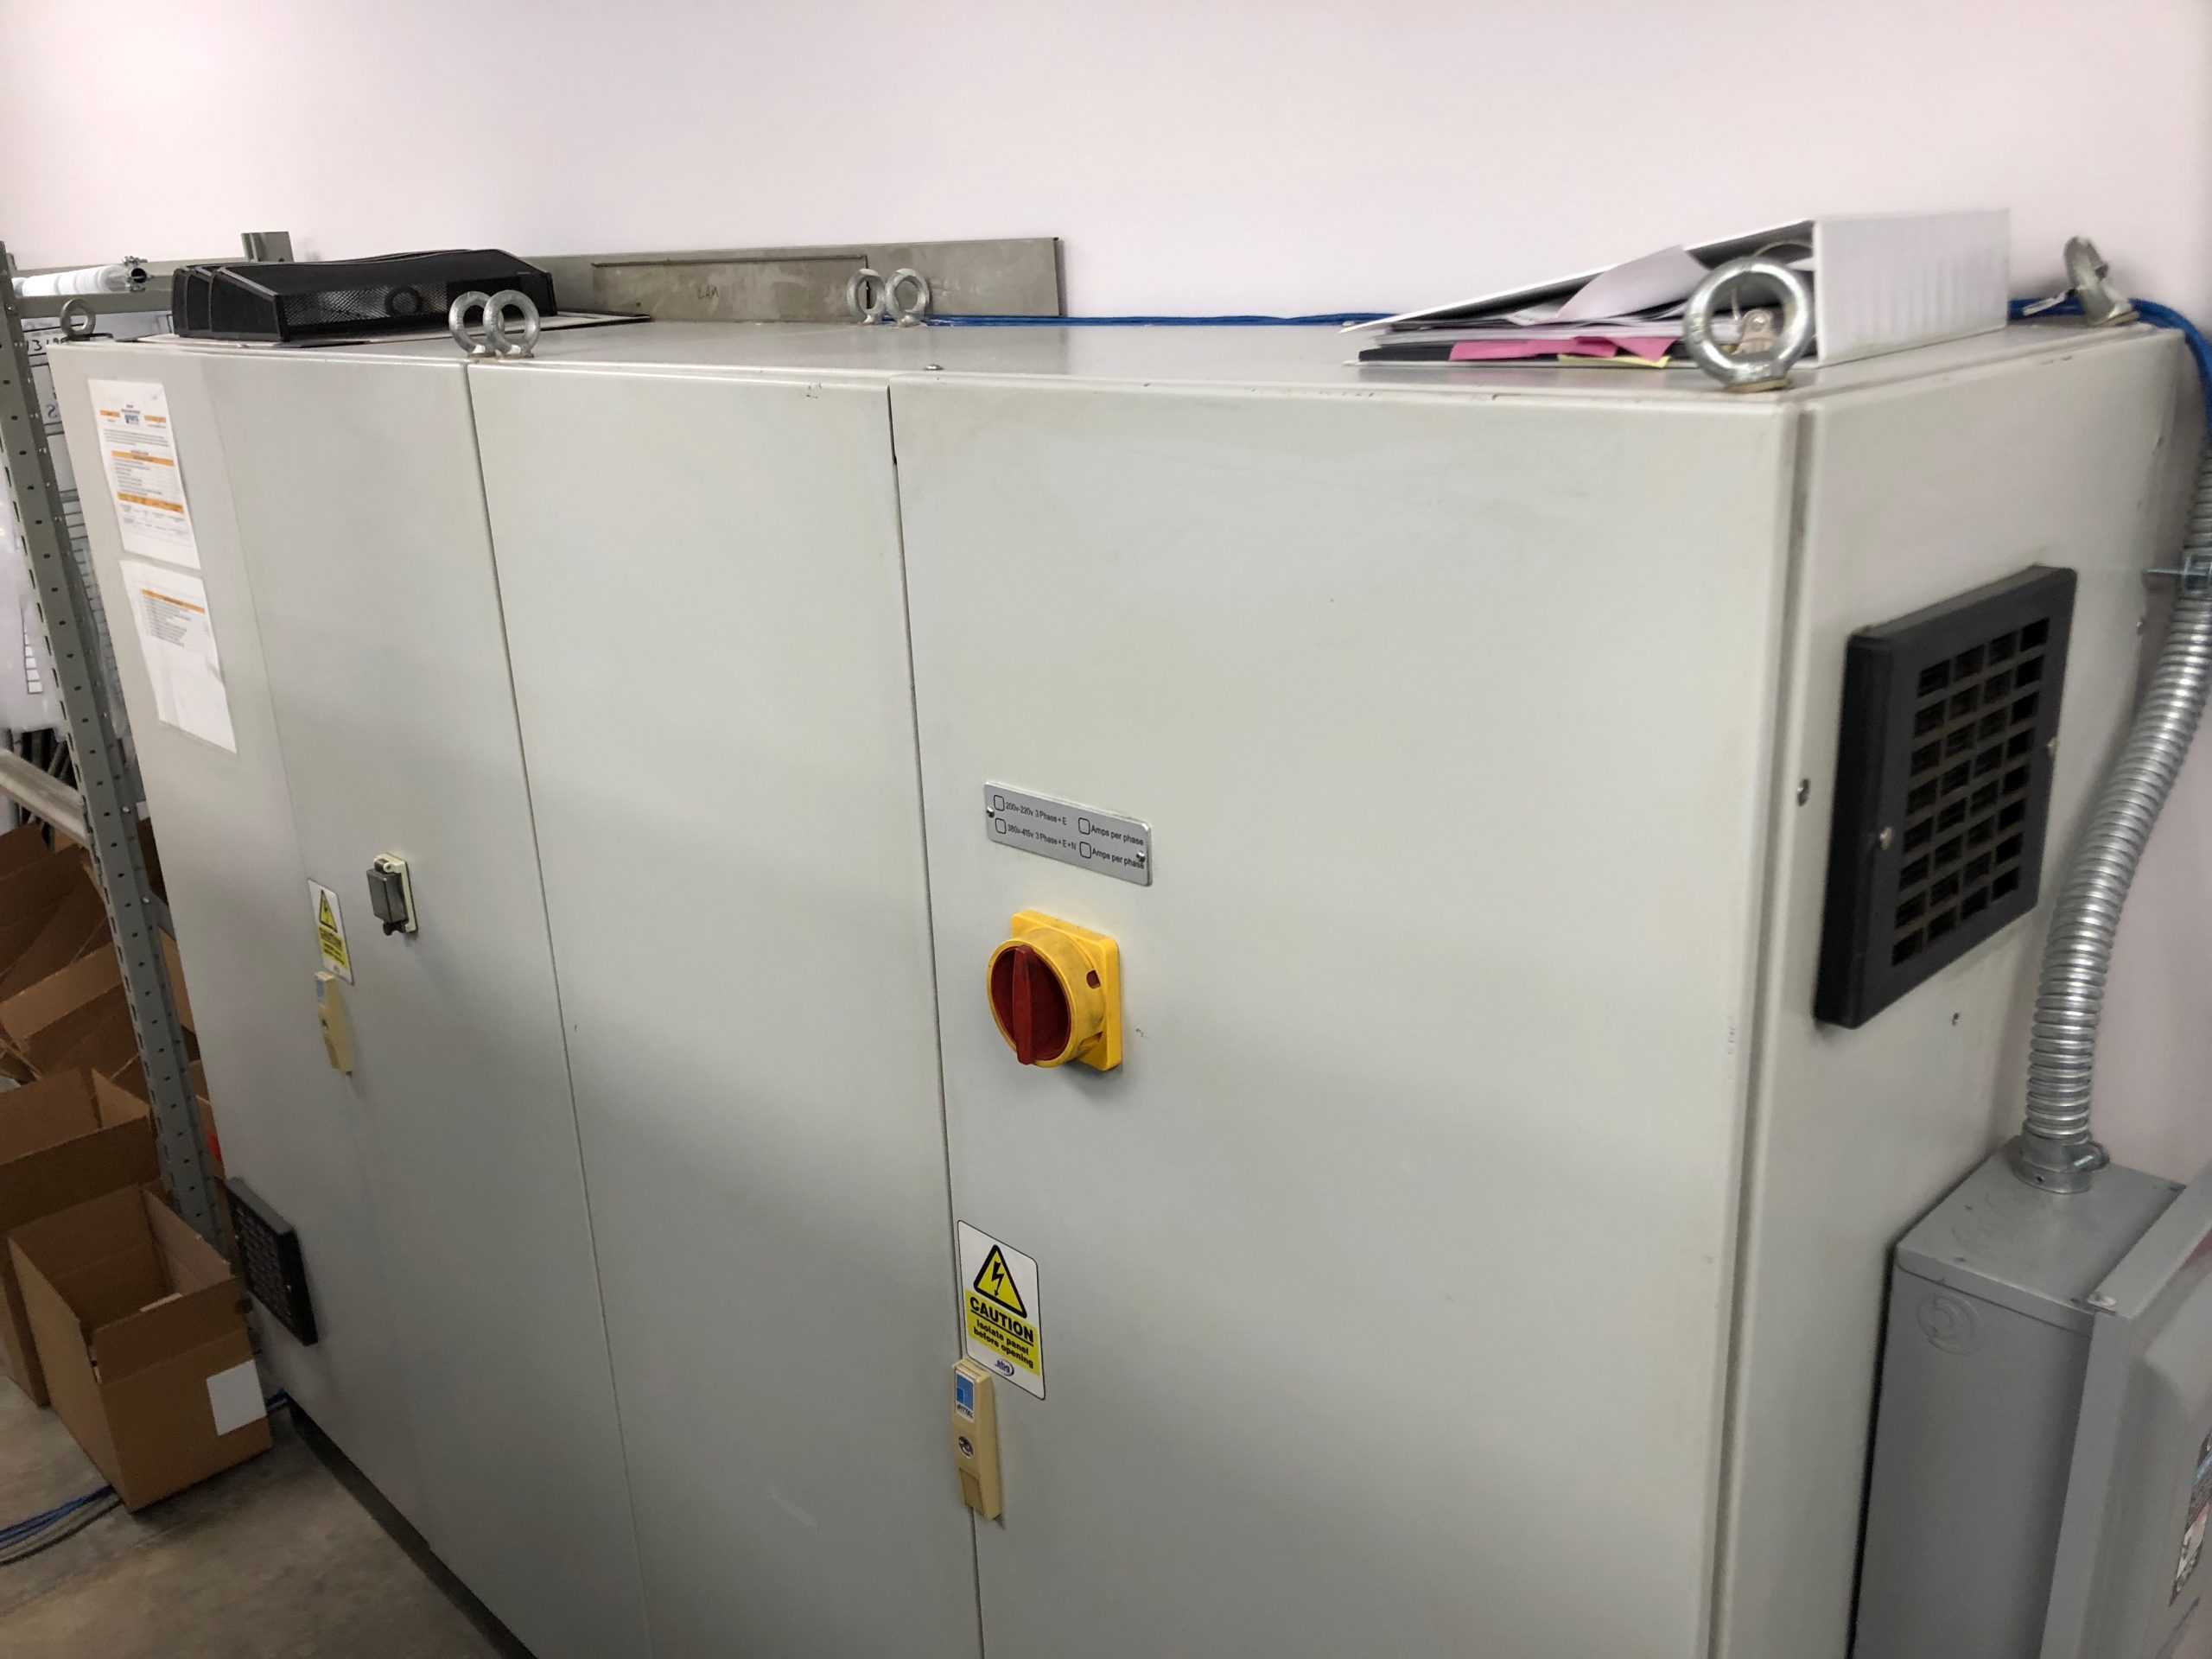 ABG Digicon Series 2 - Used Flexo Printing Presses and Used Flexographic Equipment-2